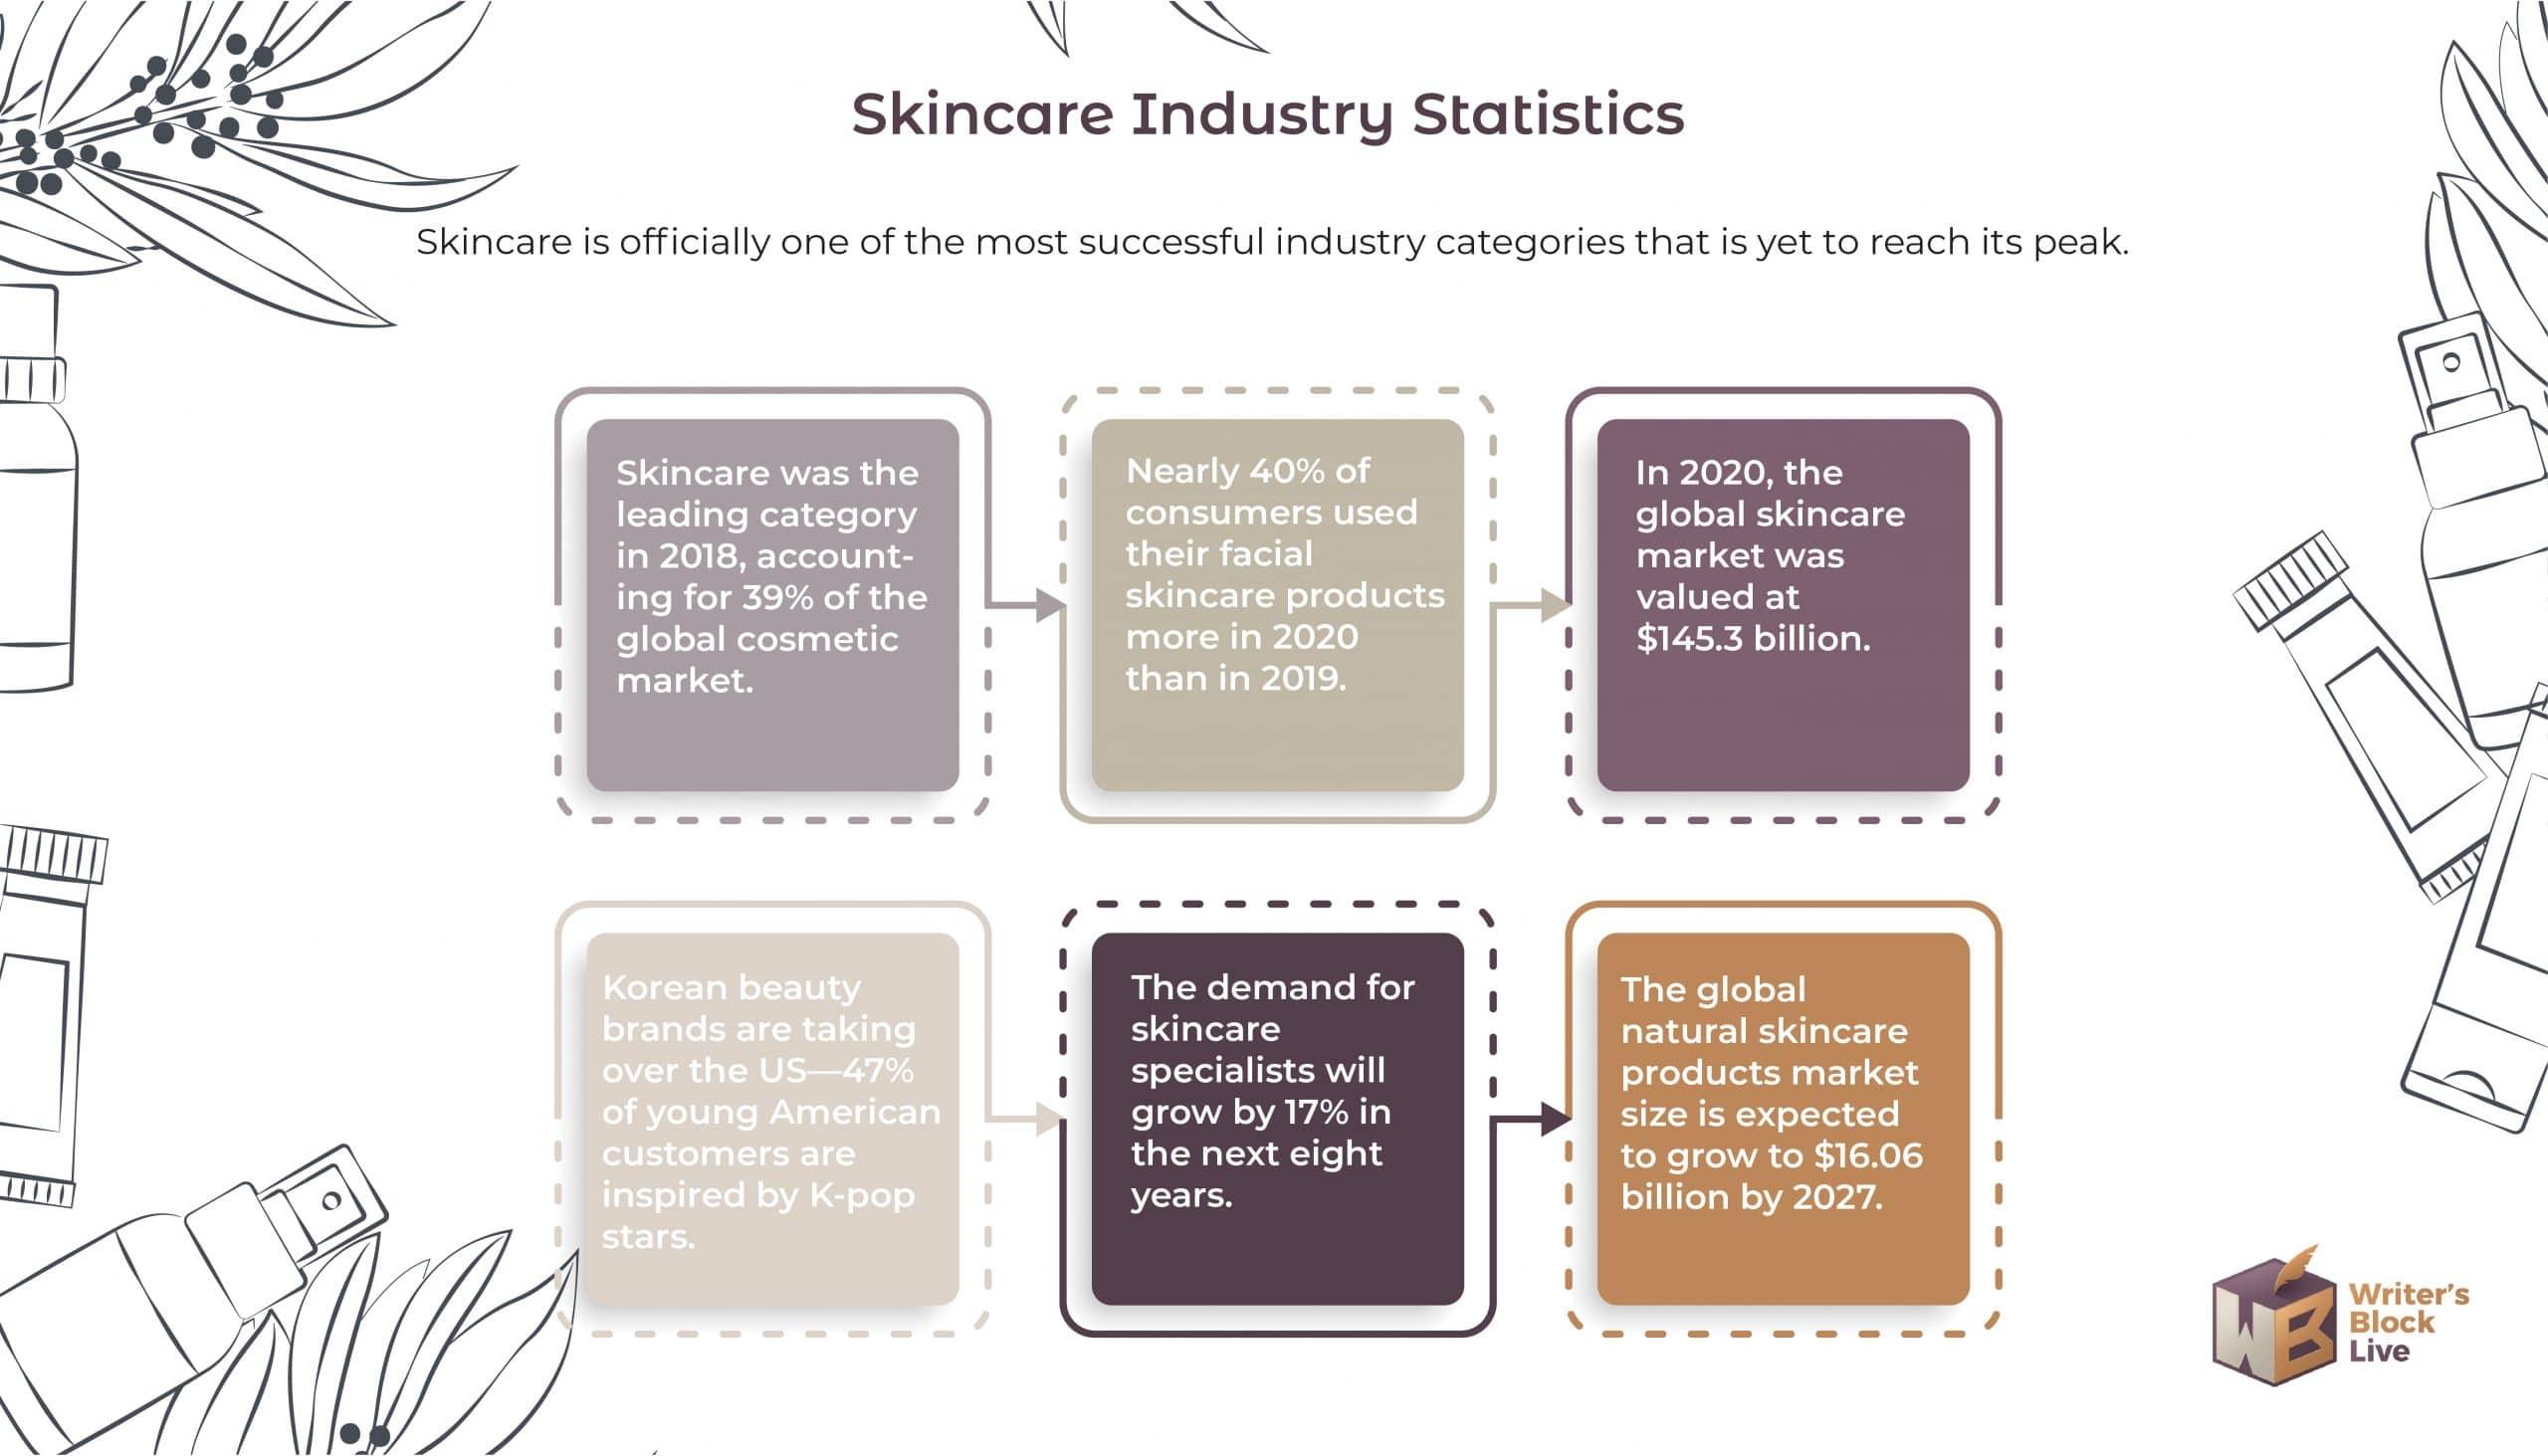 Skincare Industry Statistics